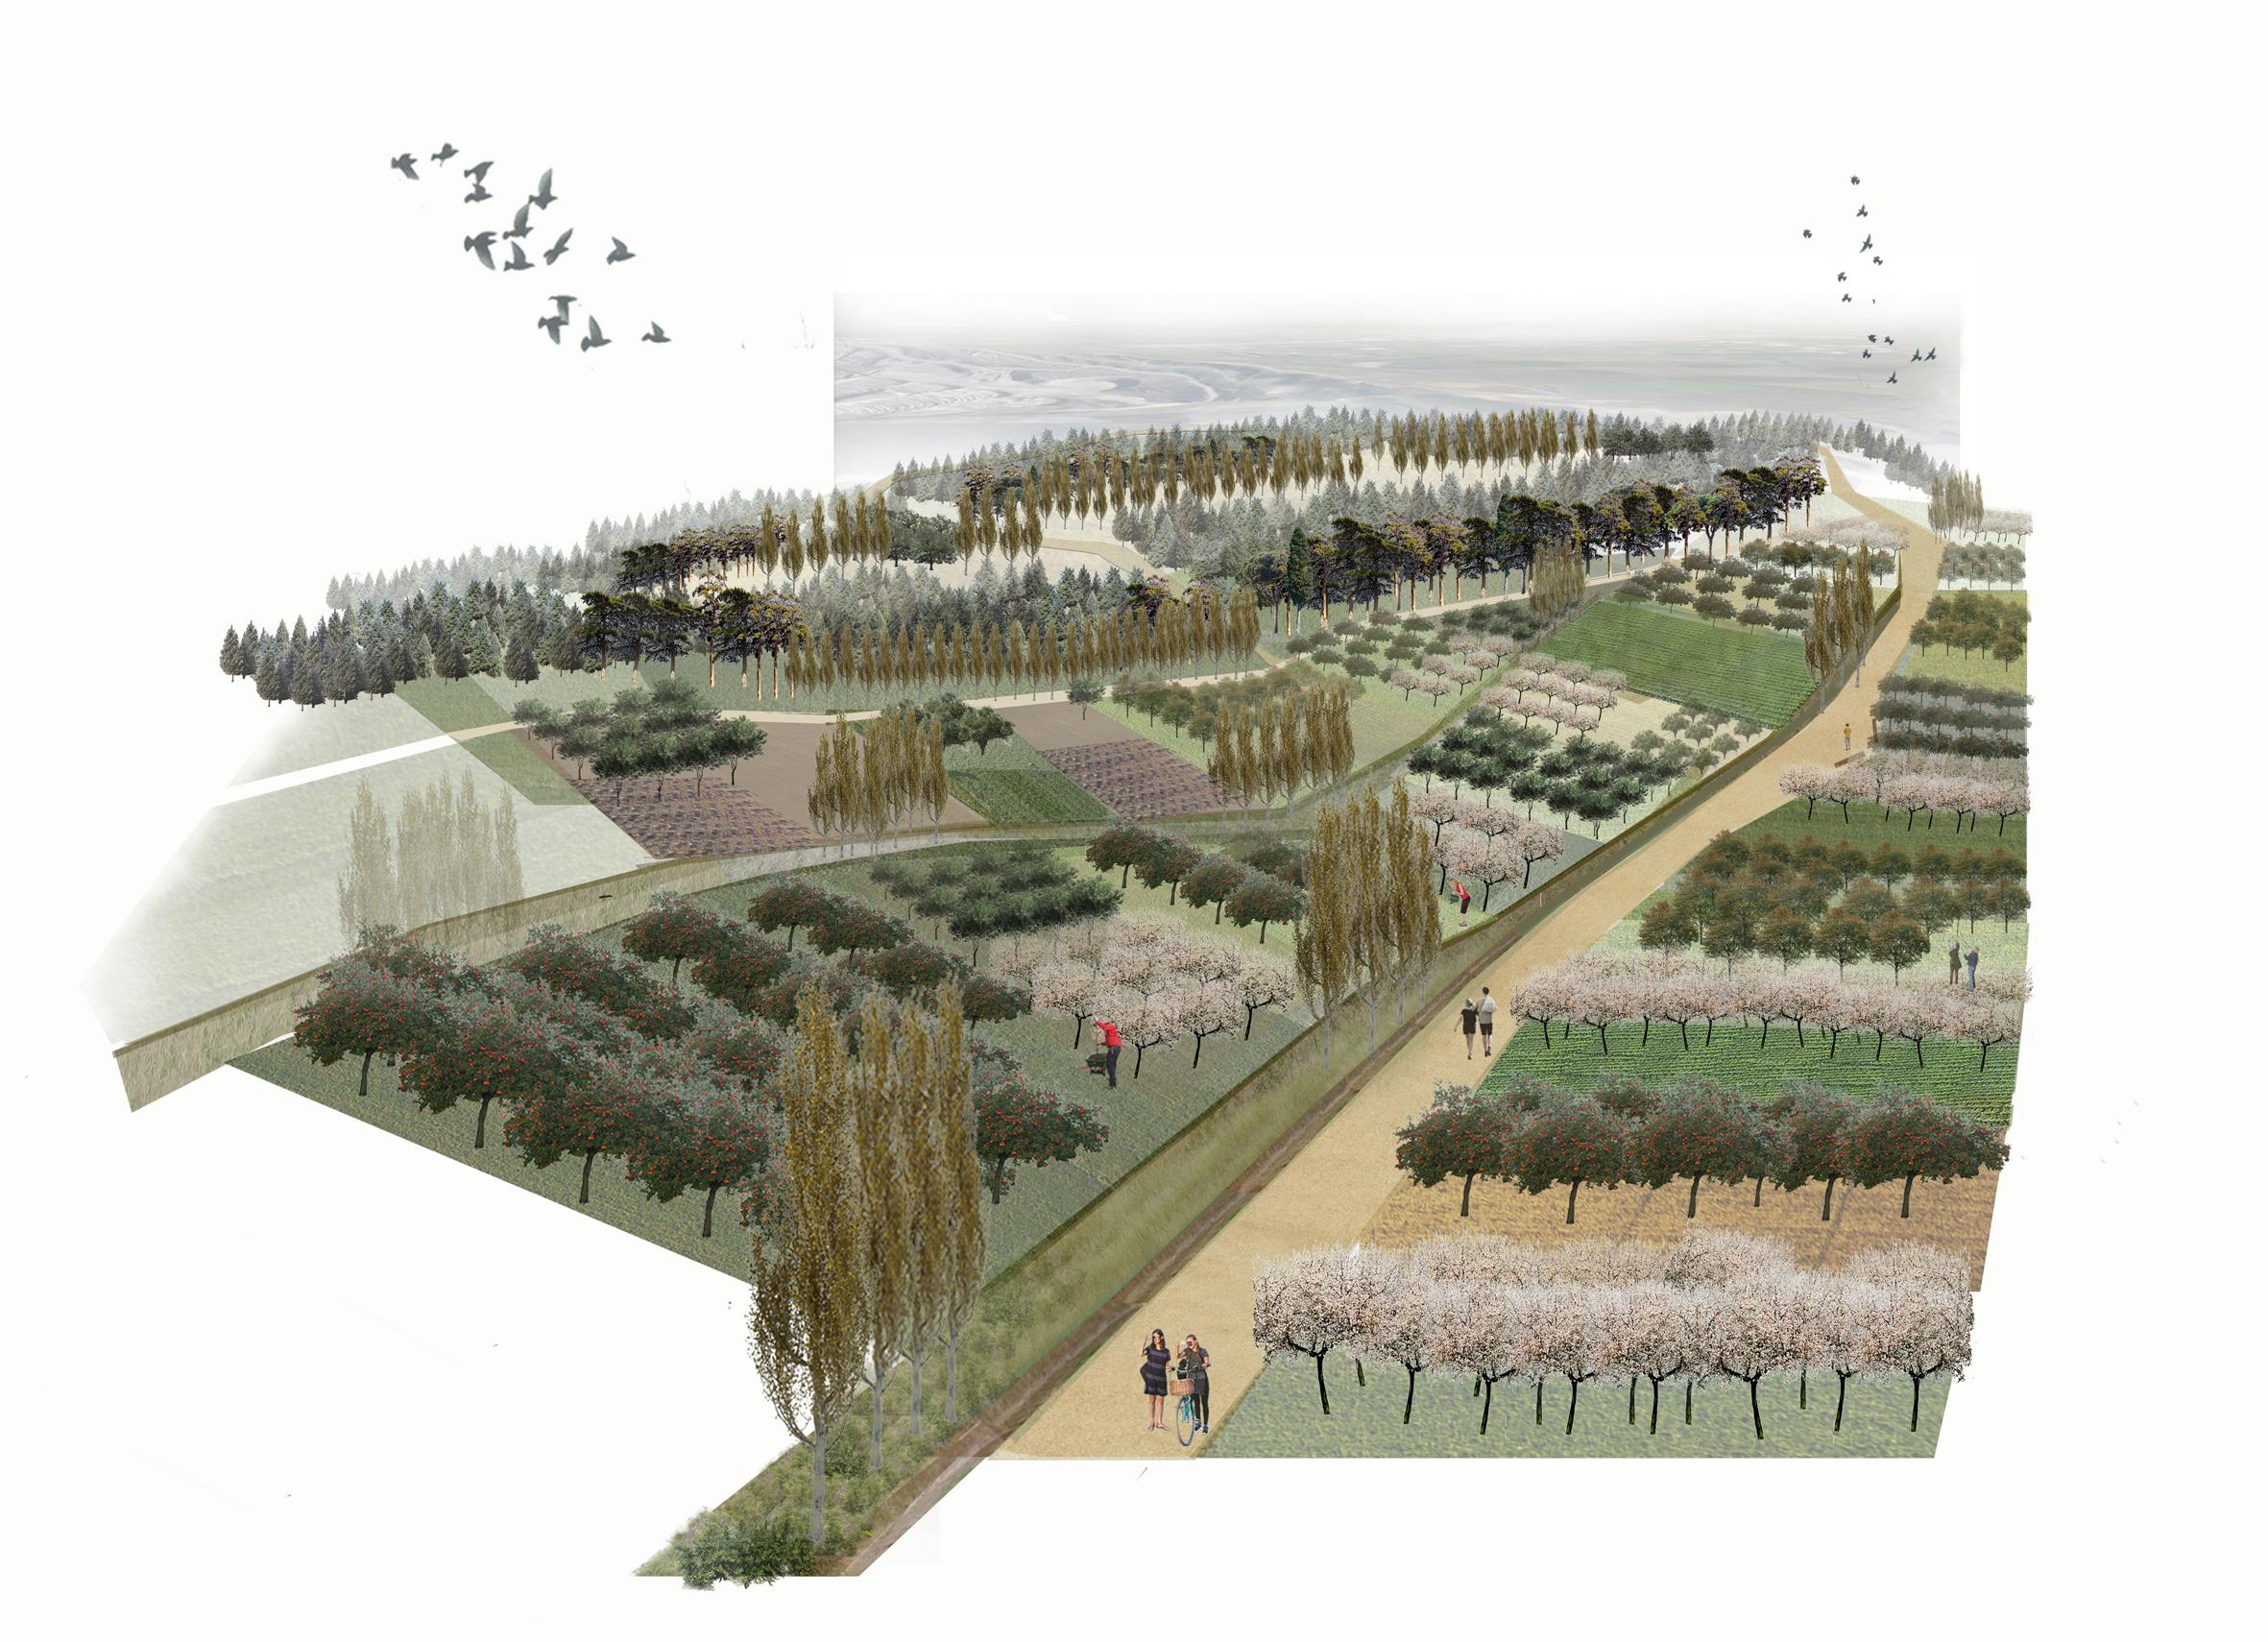 1524596182142 02 topio7 eco corridor birds eye view cultivations